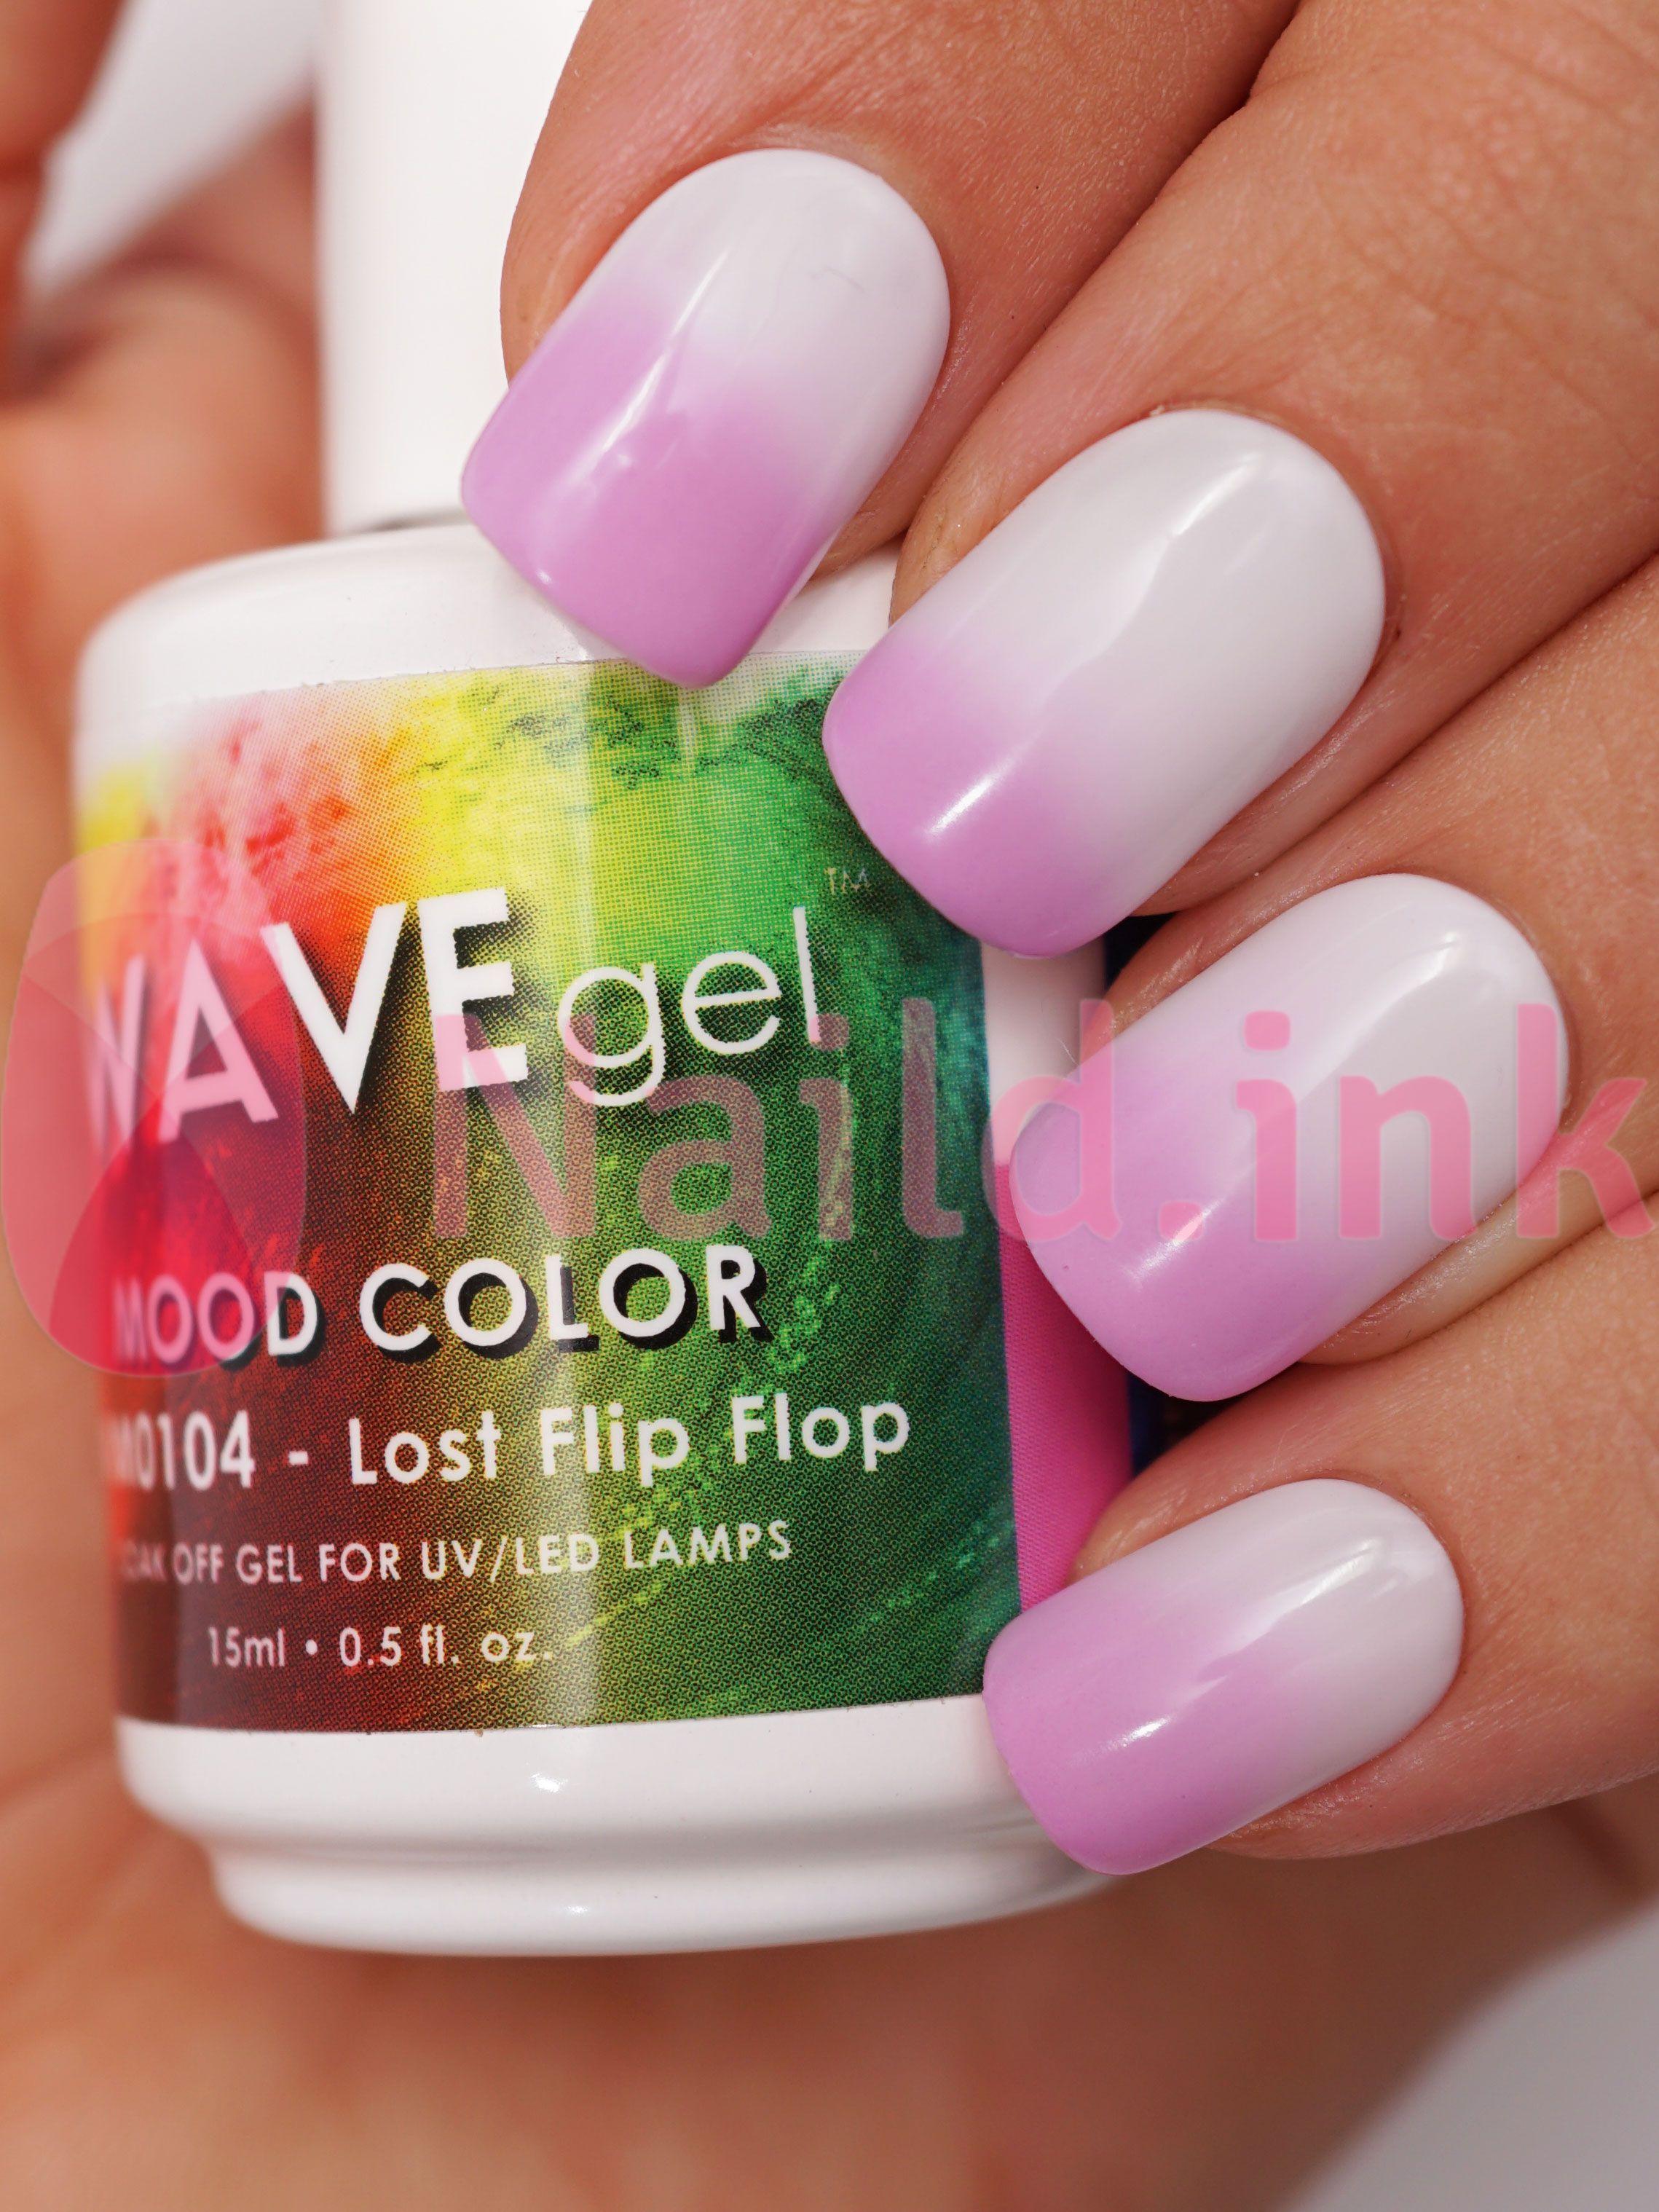 WAVEgel Mood Color Lost Flip Flop | Makeup and beauty | Pinterest